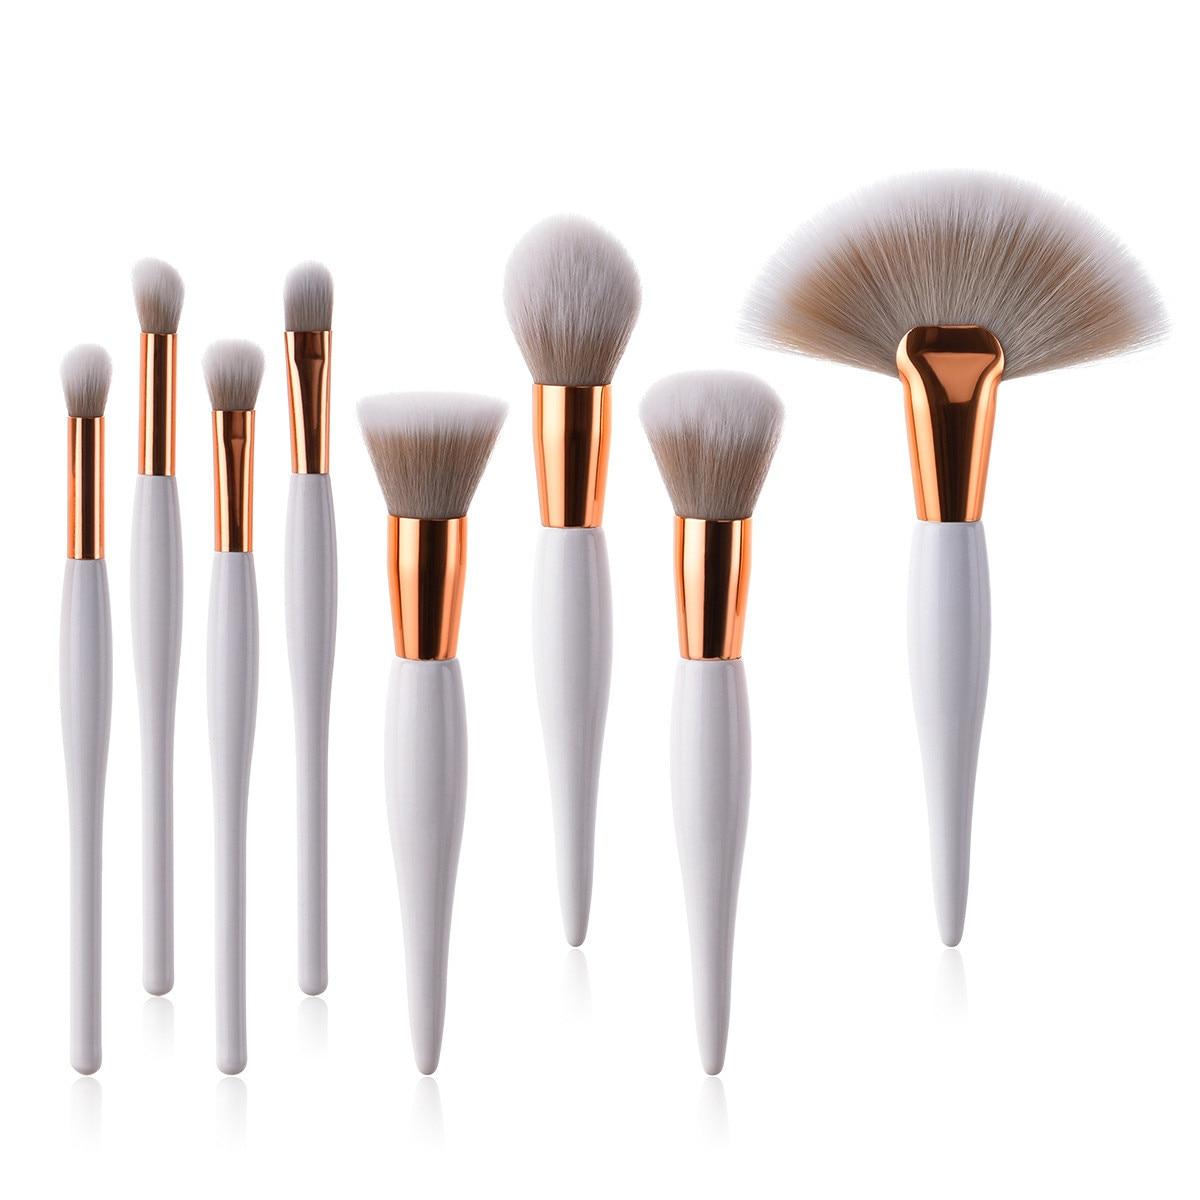 Tesoura de Maquiagem escova cosmética conjunto Makeup Brush Kit : Powder Foundation Face Eye Blending Brush Kit